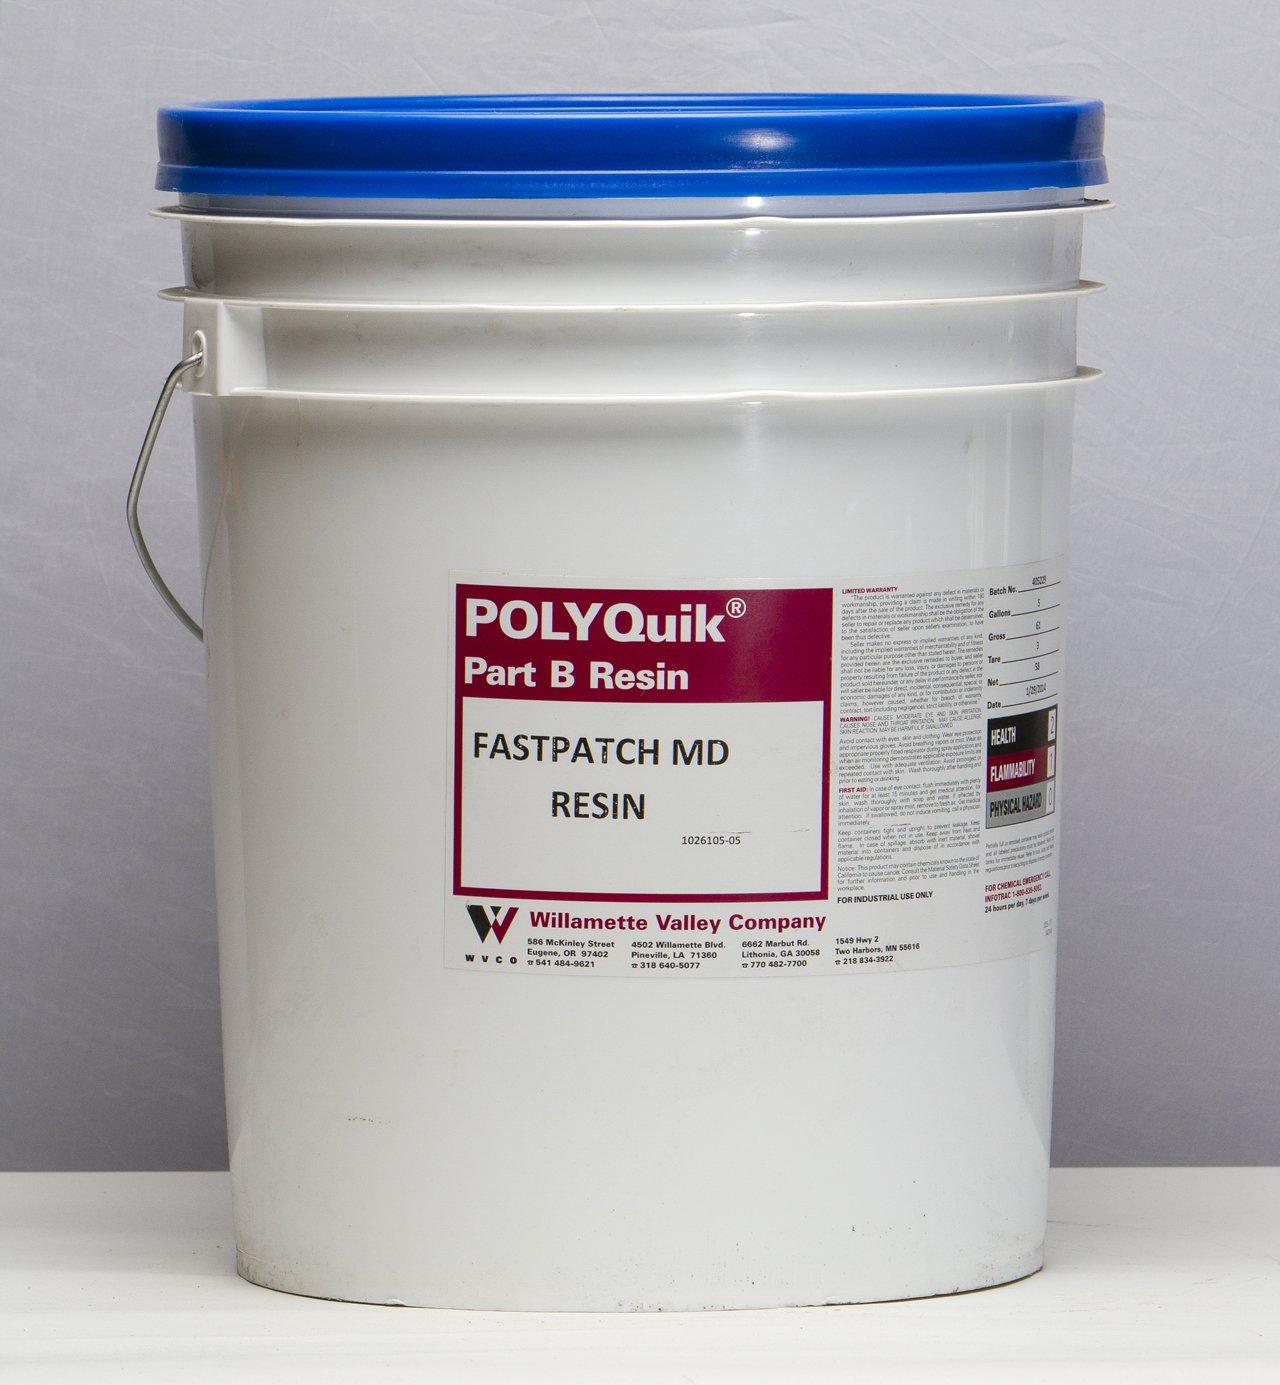 FASTPATCH MD Gray (RESIN) 5-Gal Meter Dispensed Elastomeric Polymer